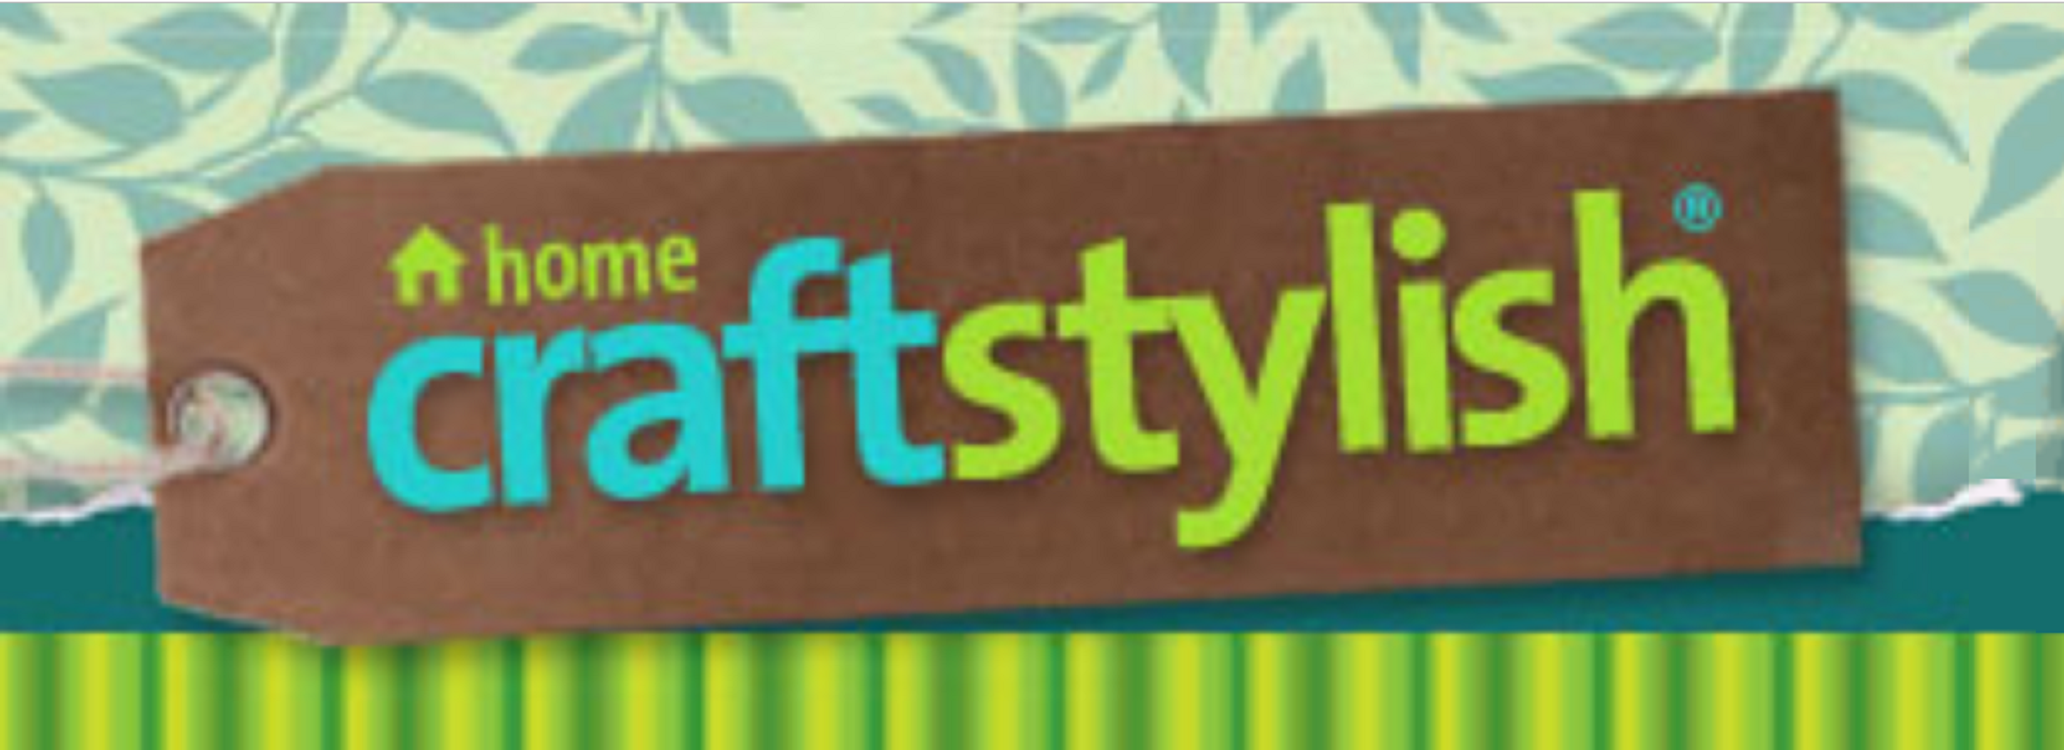 Write & guest post on lifehack site craftstylish.com DA68 PA48